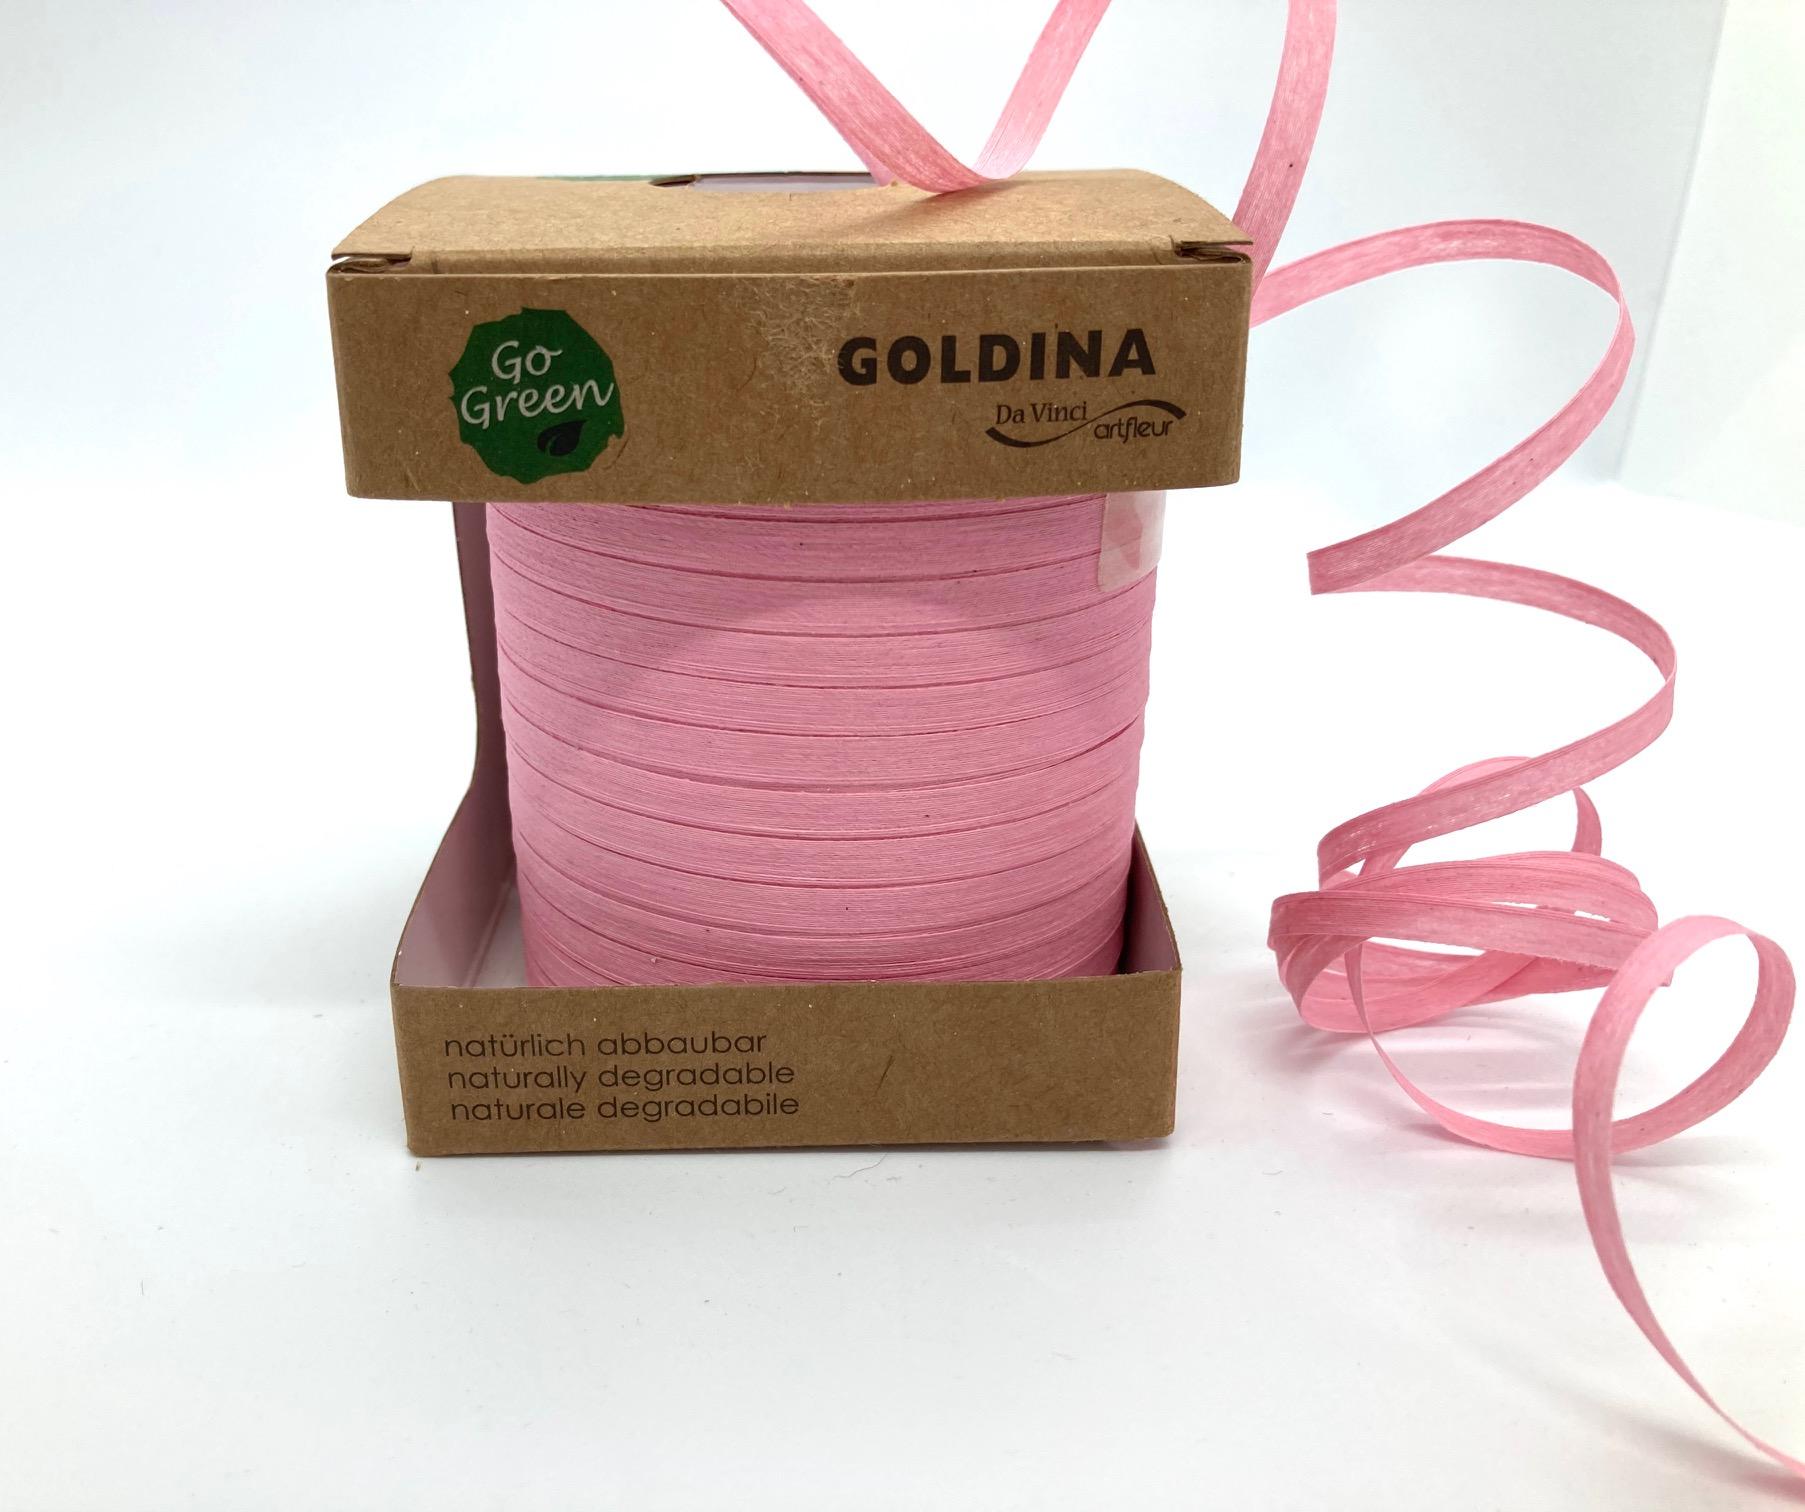 Ringelband Rosa, 100 Meter, 100% Baumwolle